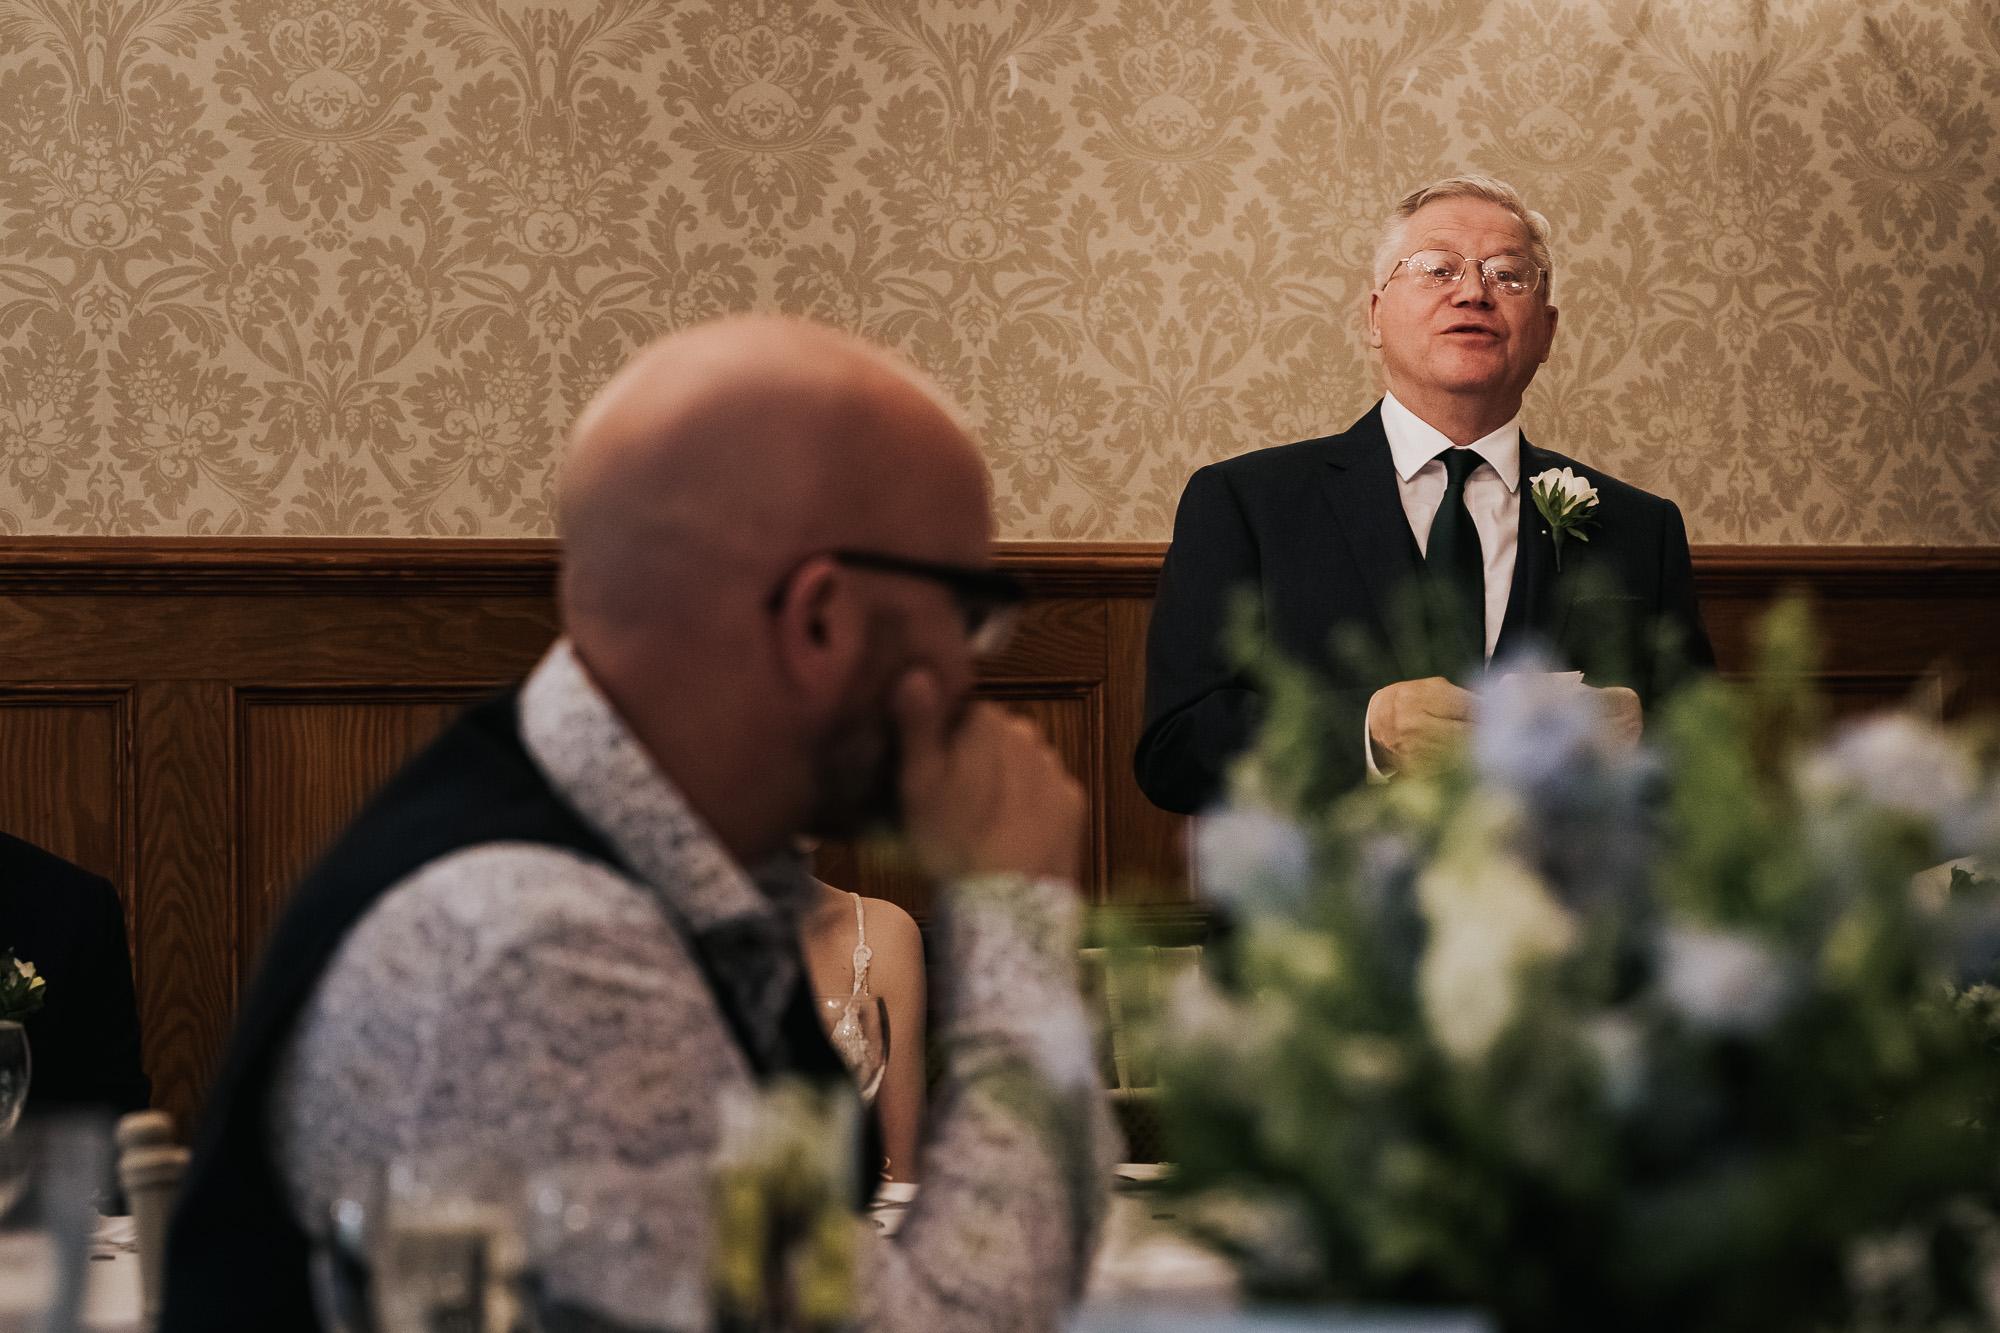 Nunsmere Hall Hotel Wedding photograhpy in cheshire wedding photographer (32 of 42).jpg